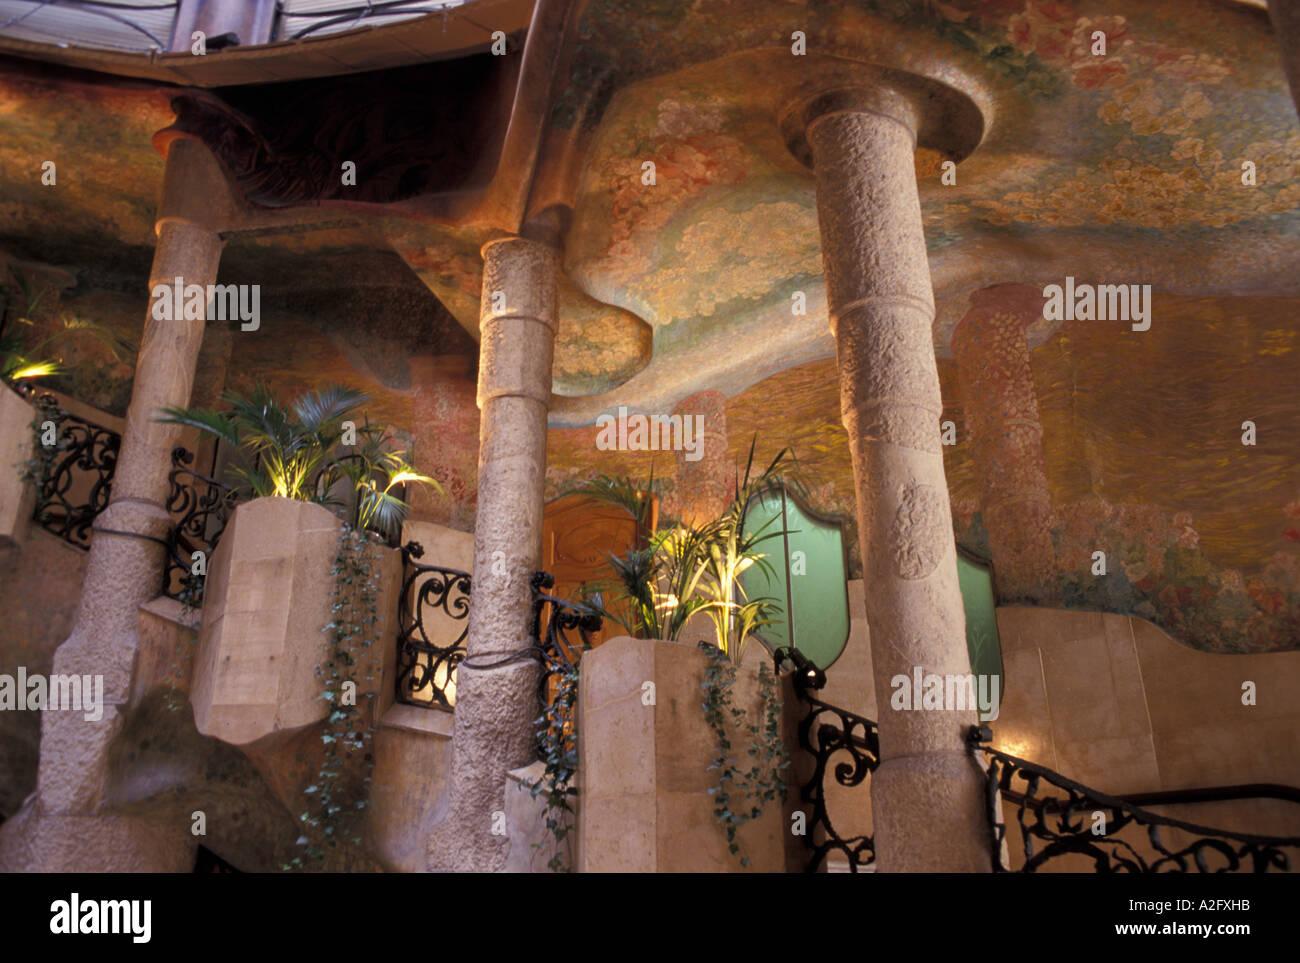 Europe, Spain, Barcelona, interior of Casa Mila by A. Gaudi Stock ...